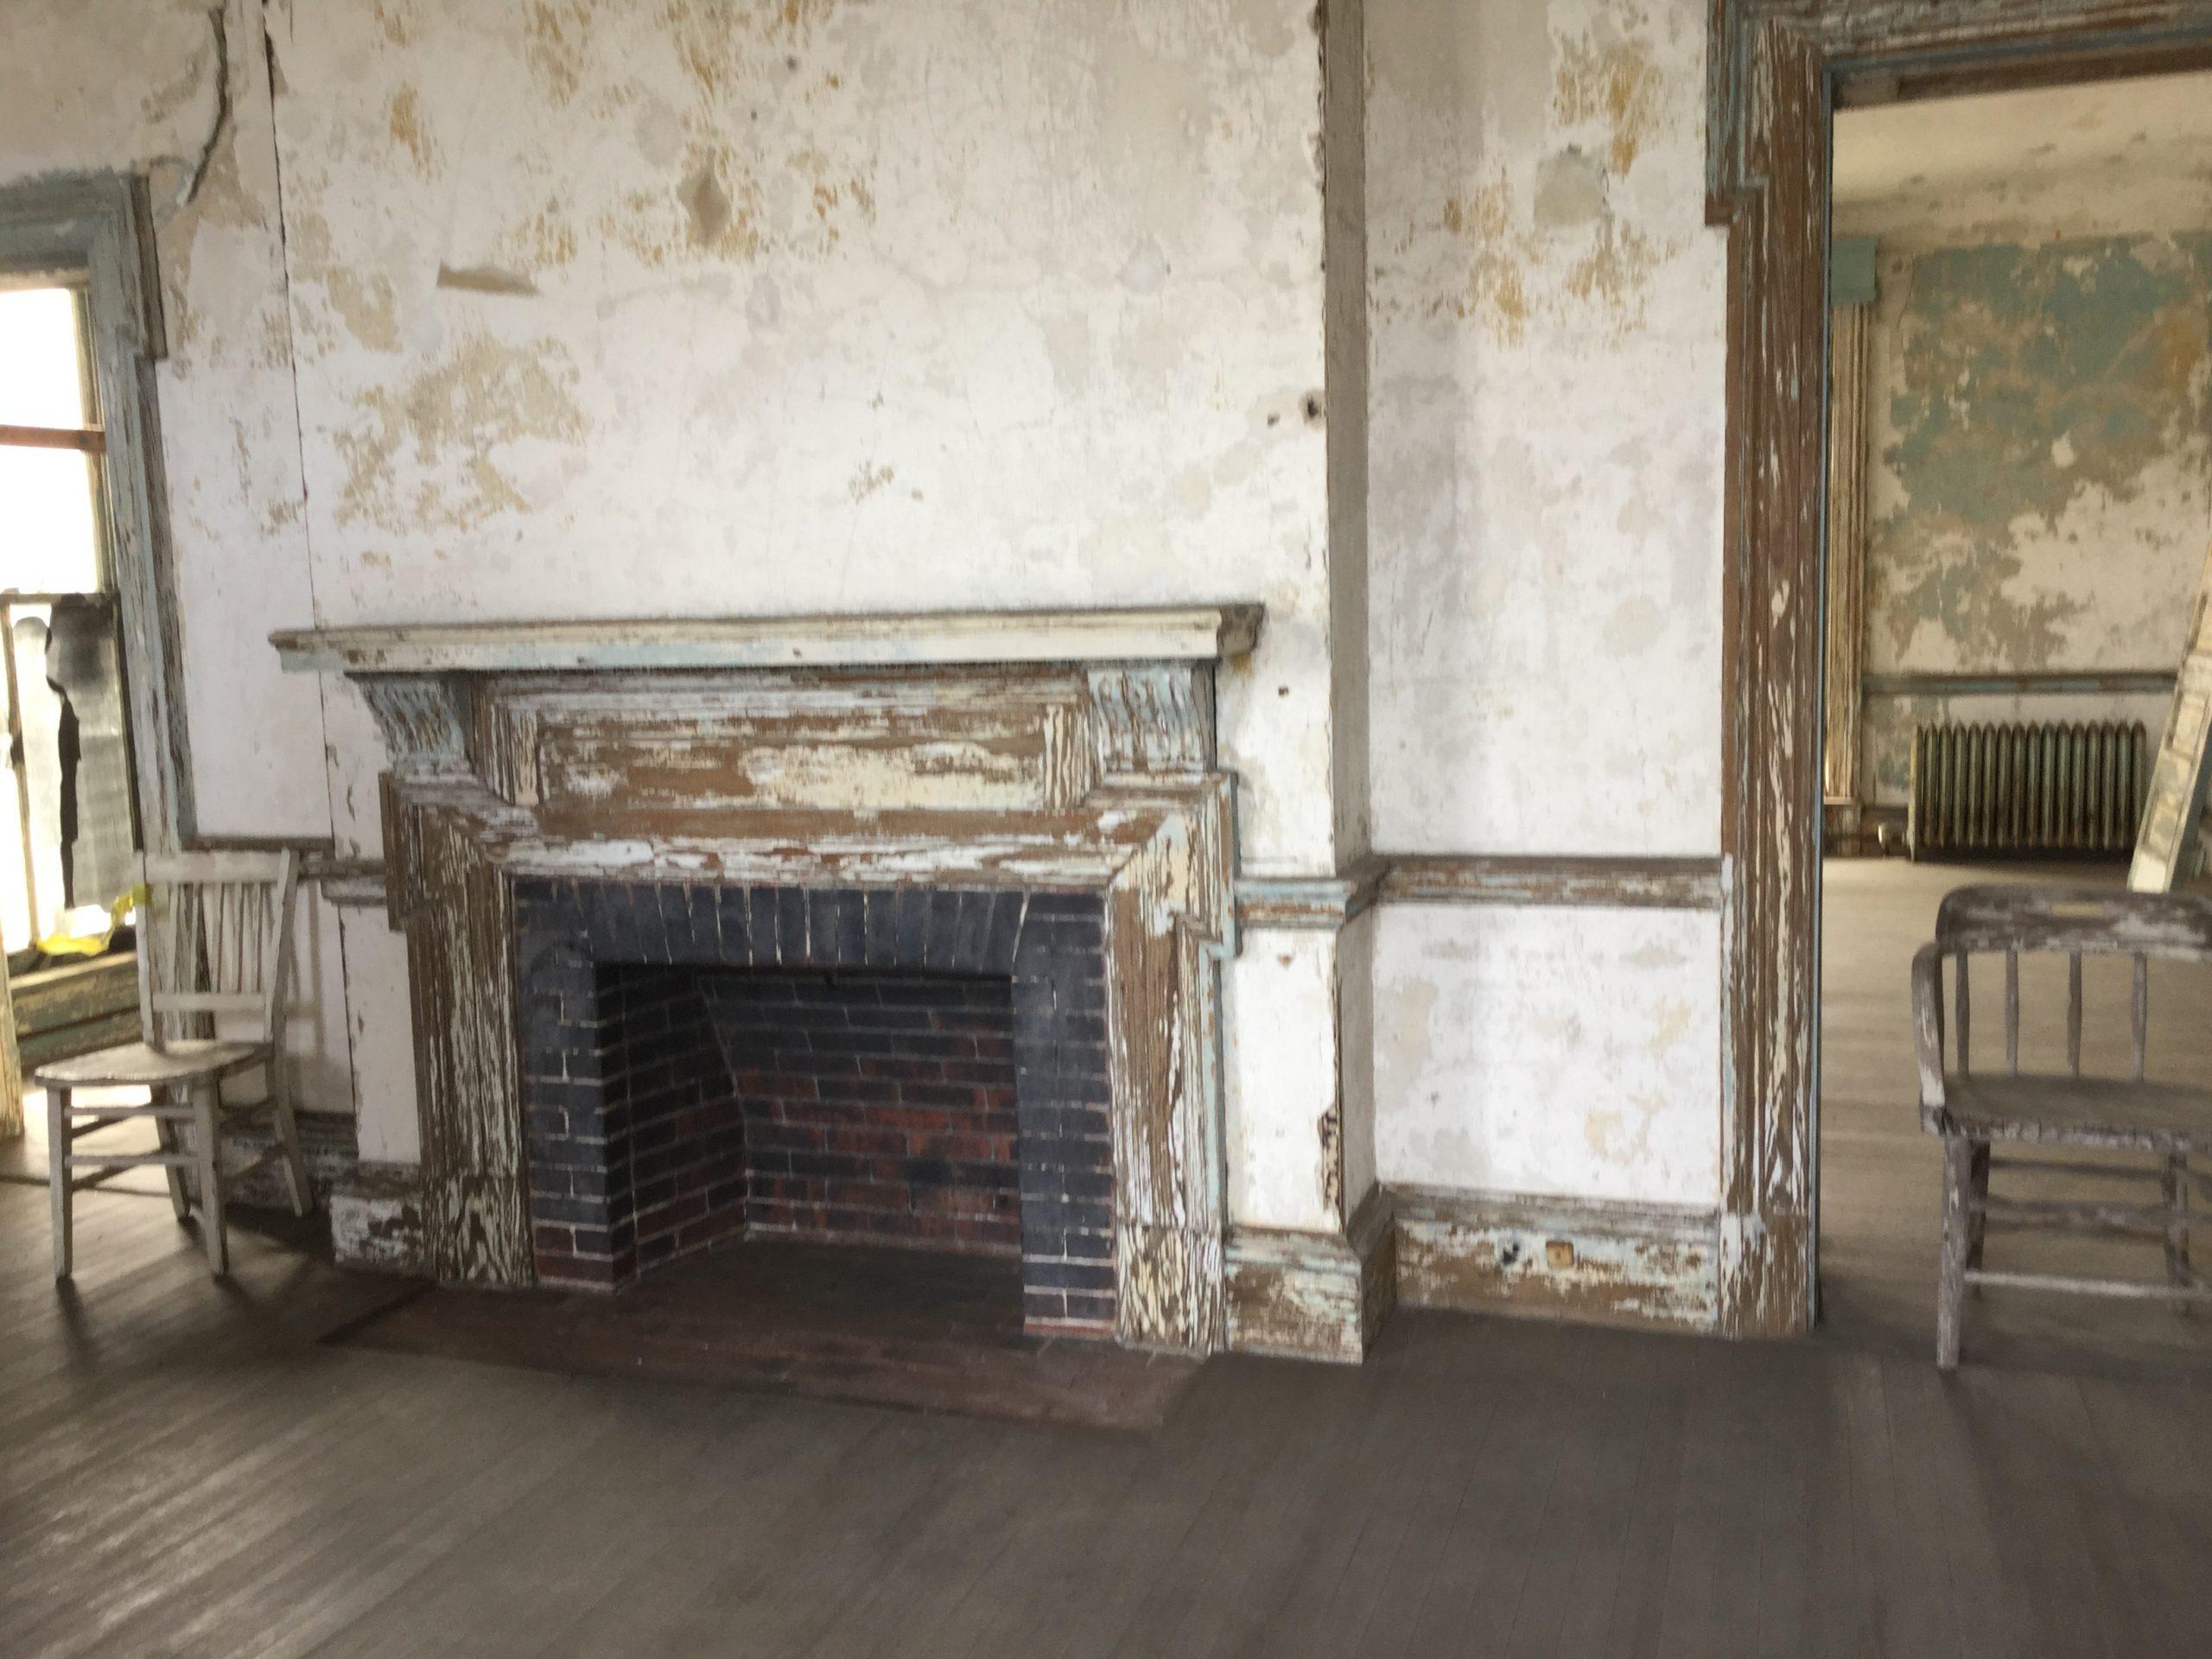 abandoned Ellis Island hospital complex